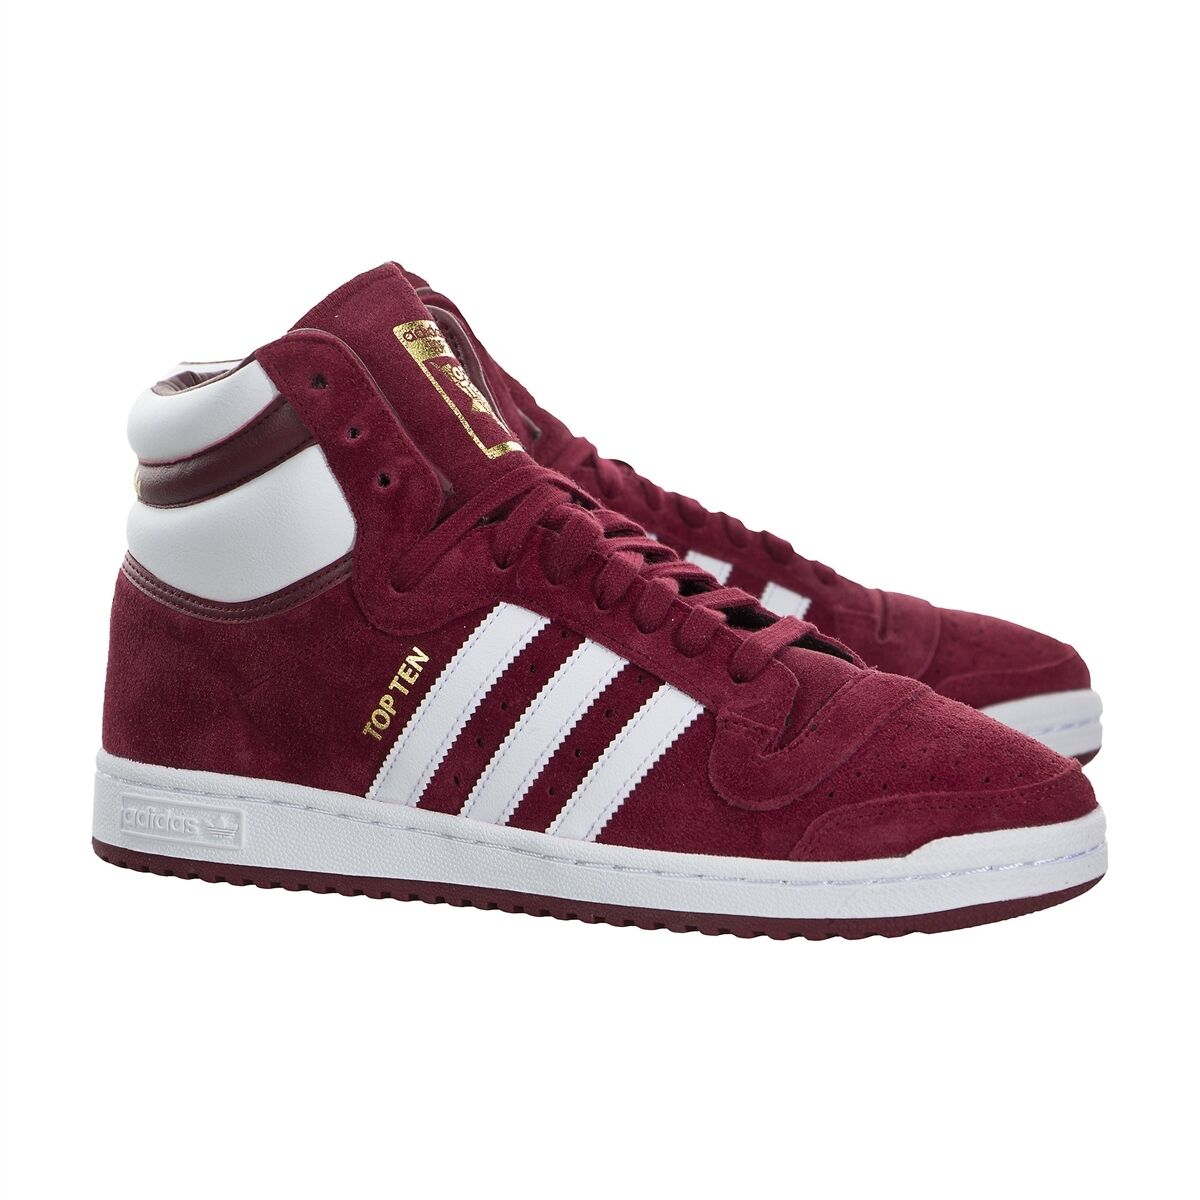 Adidas Men Ten Athletic Shoes Originals Top Ten Men Hi Sneakers Burgundy 09ebb5